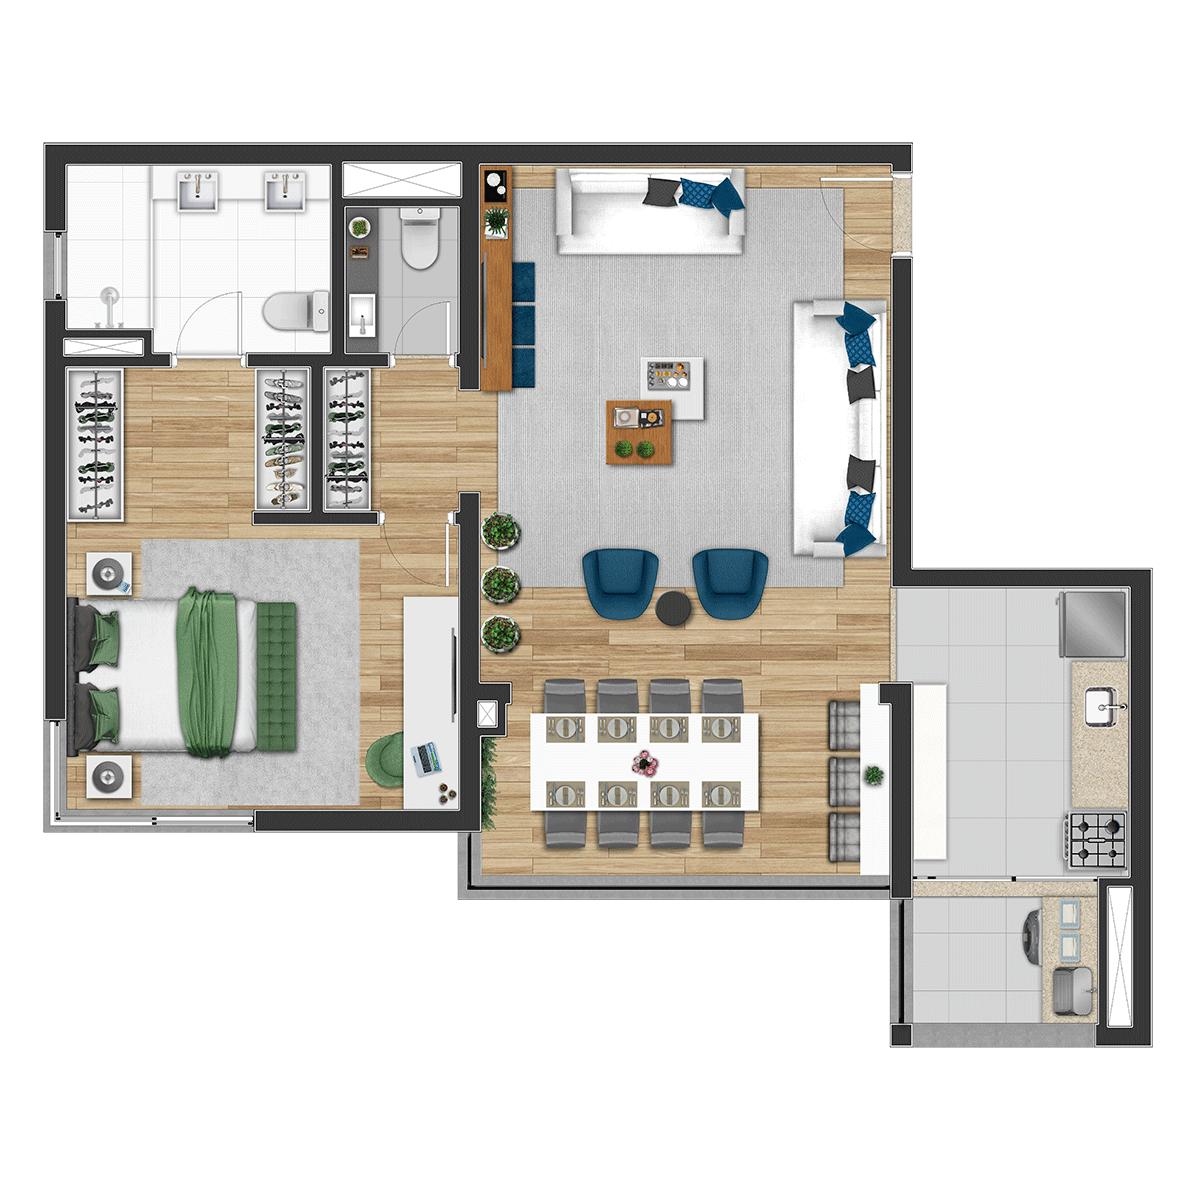 79 m² **Opção 2 1300 Jurupis